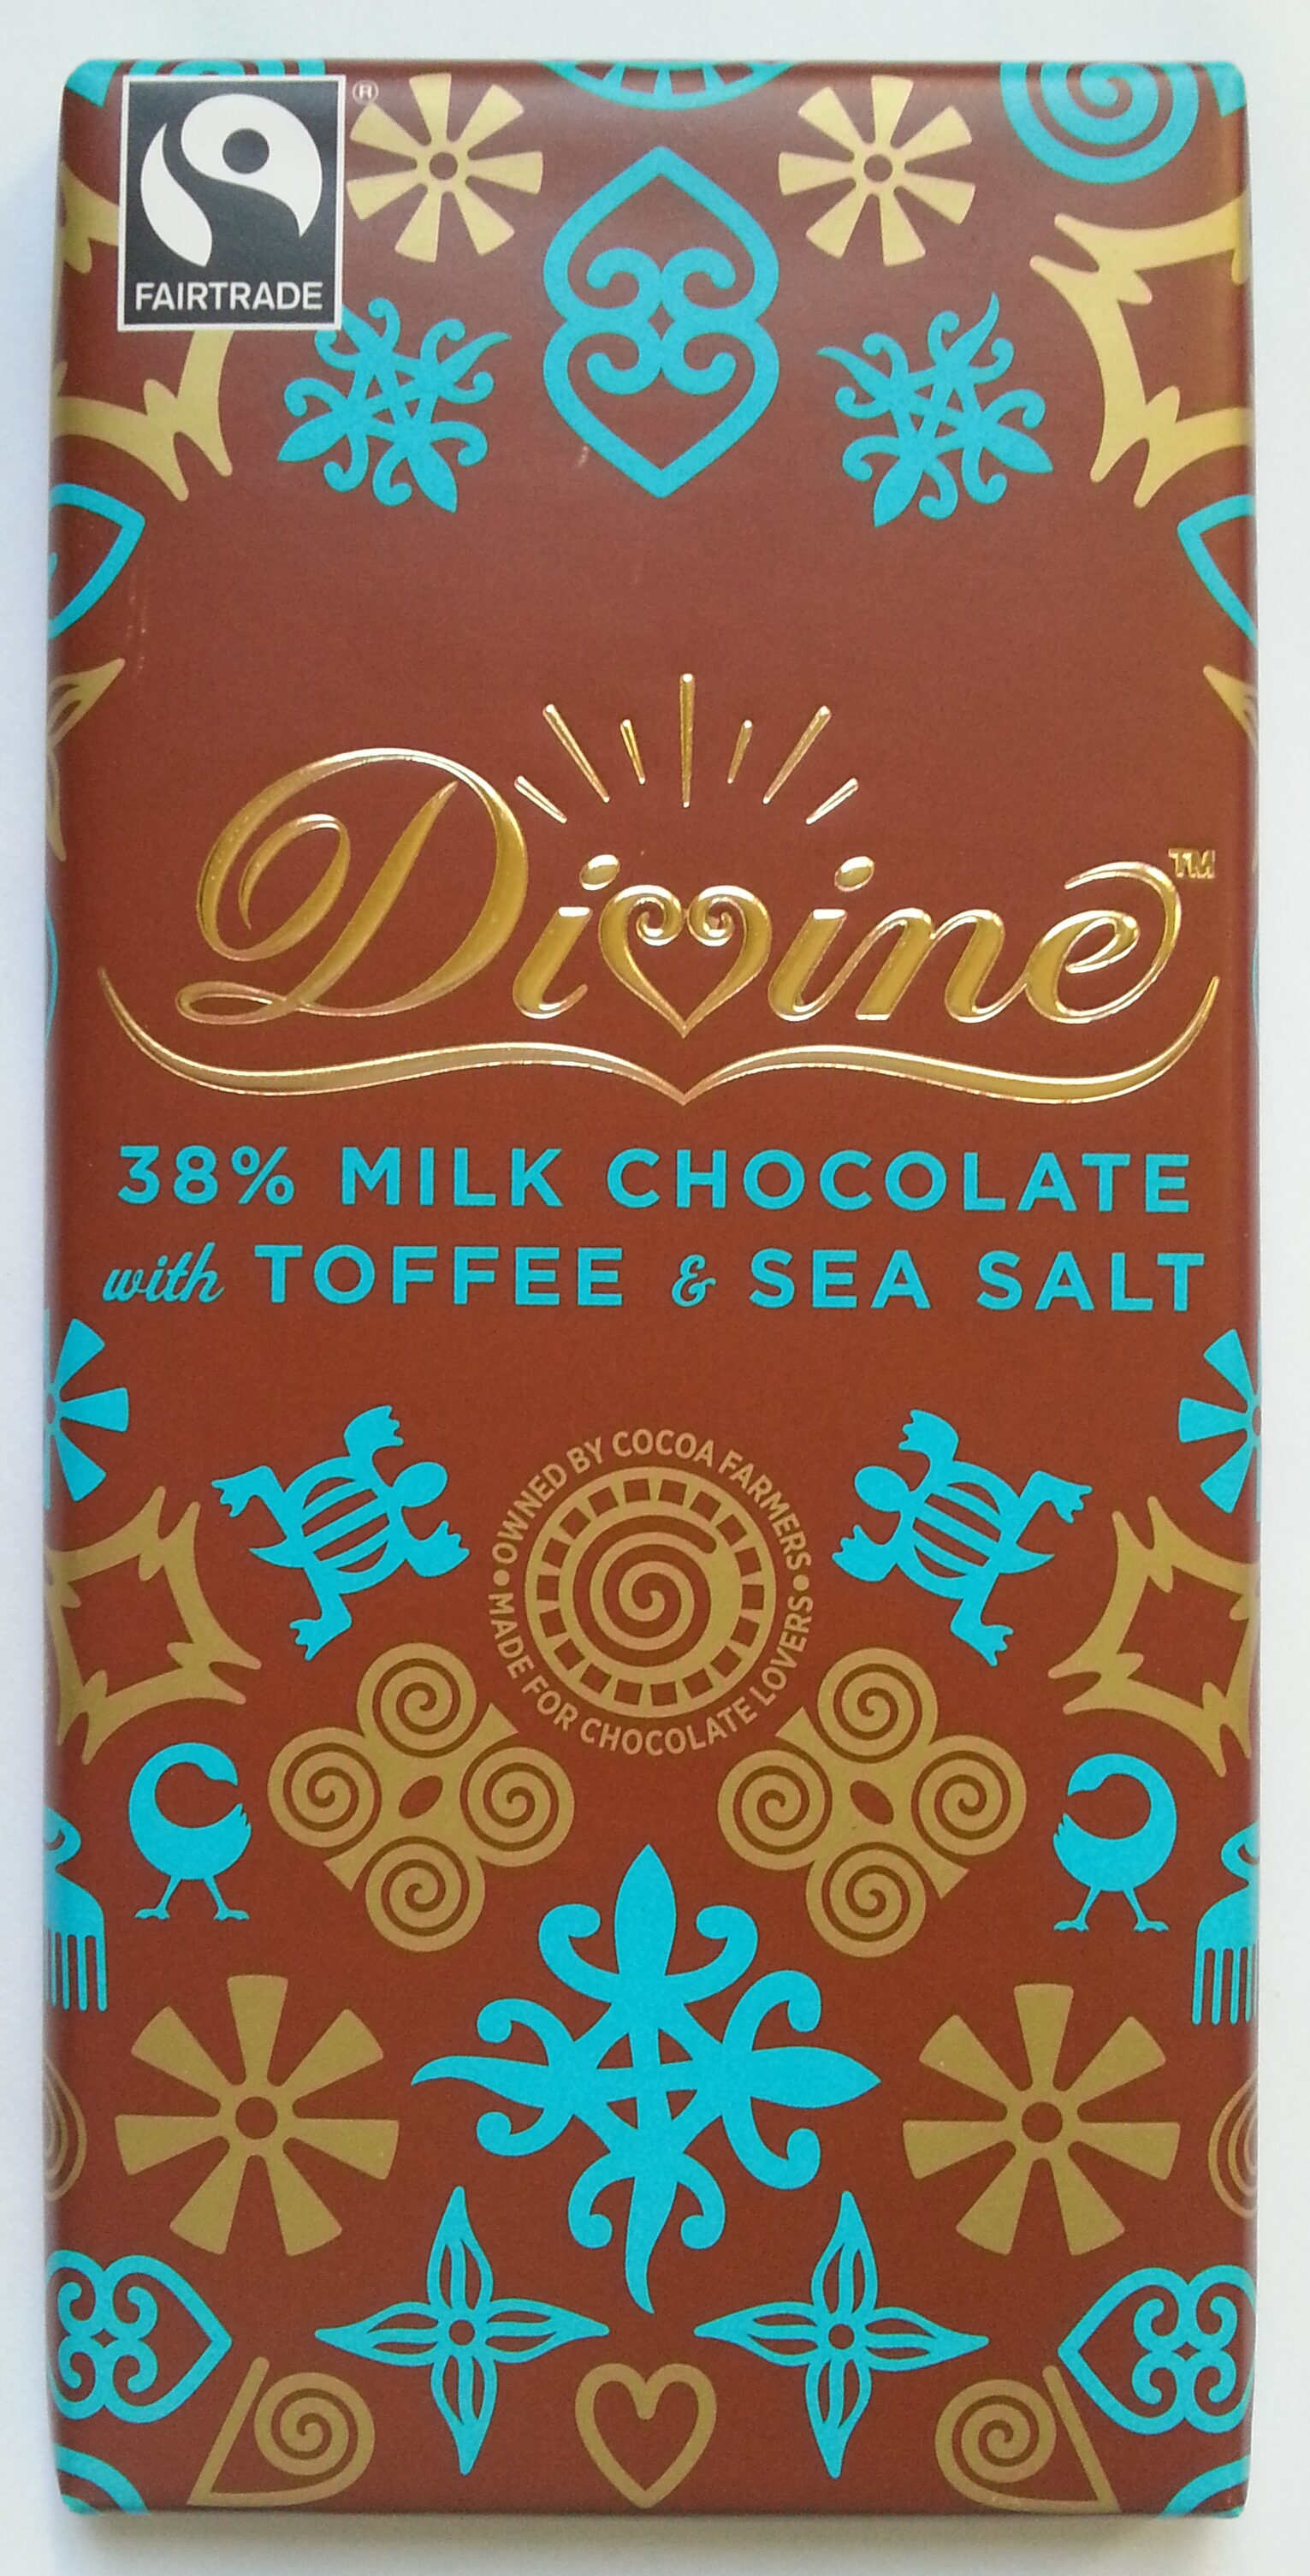 38% Milk Chocolate with Toffee & Sea Salt - Produit - en